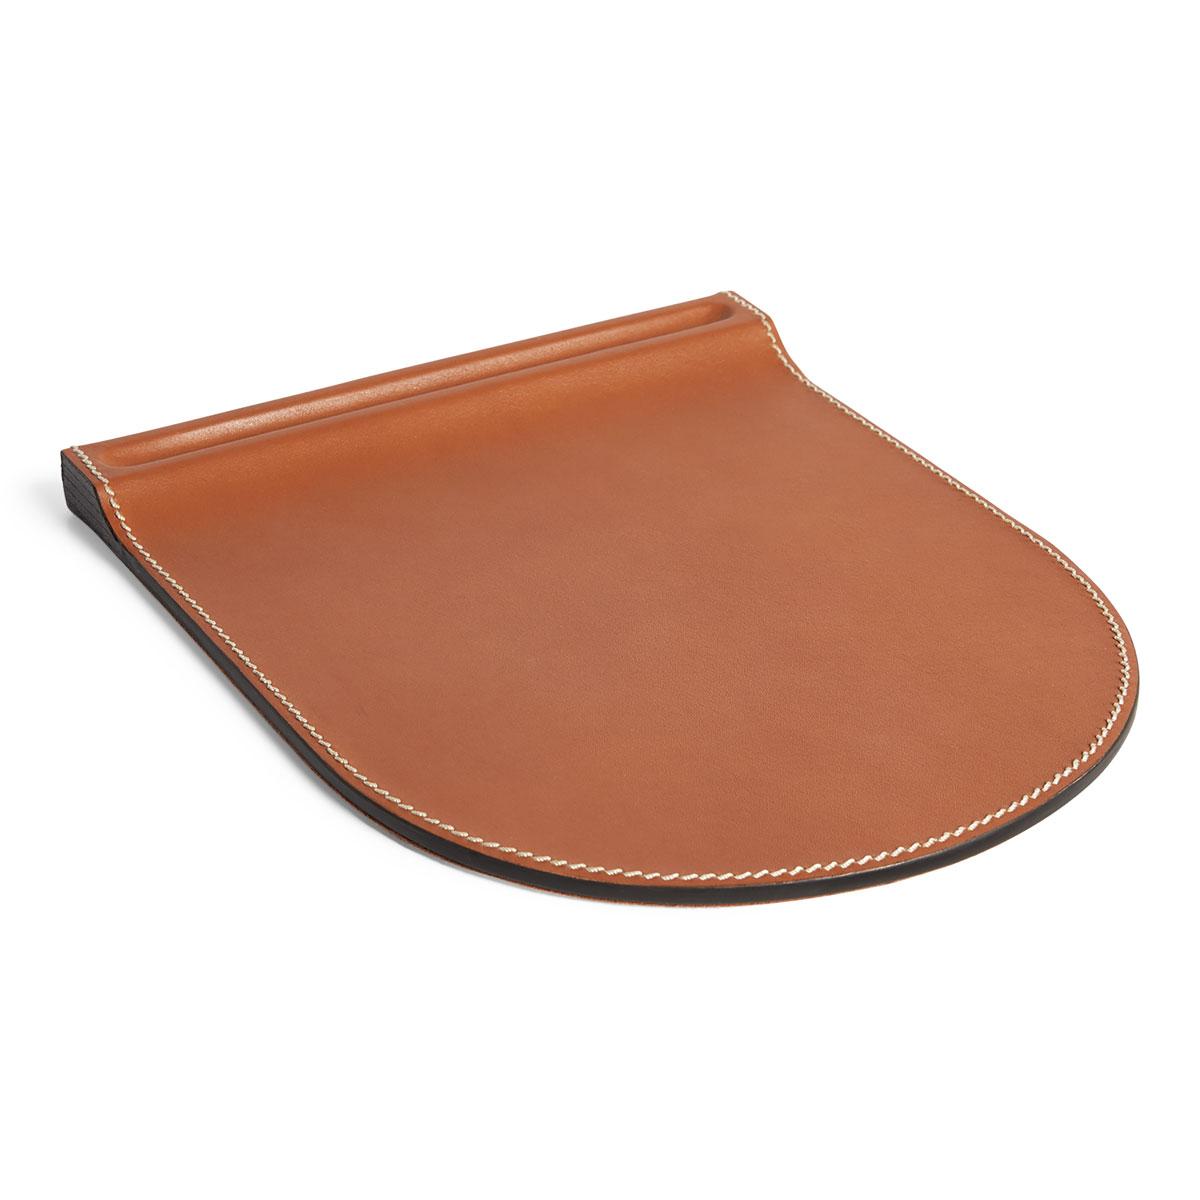 Ralph Lauren Brennan Mouse Pad, Saddle